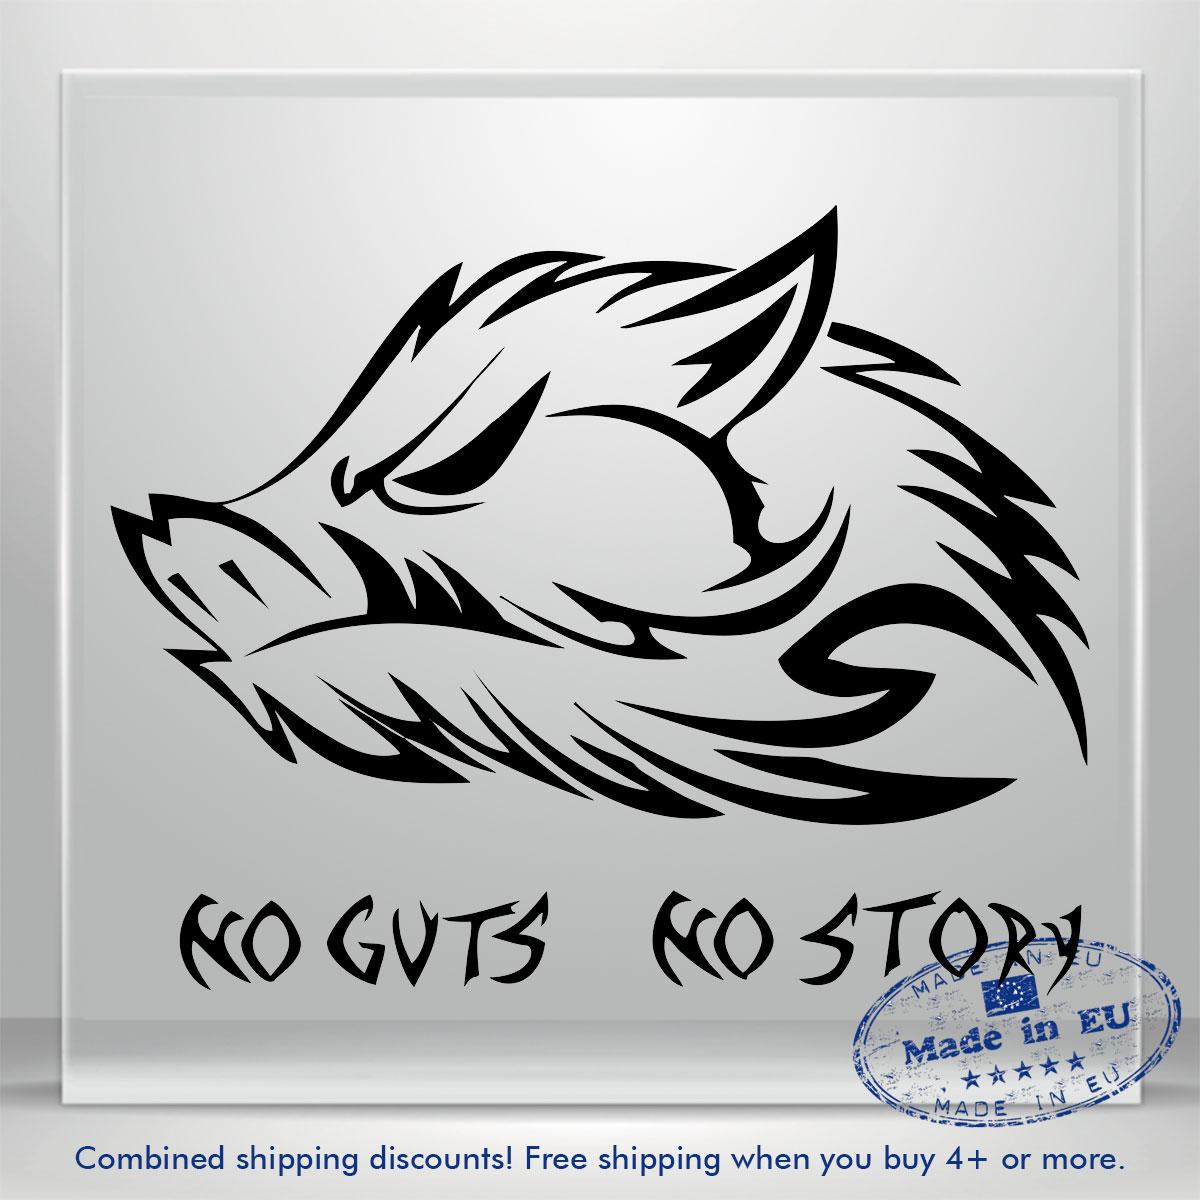 Wild Boar Pig Hunting Window Sticker Car Truck Graphic 3 Hog Slayer Decals